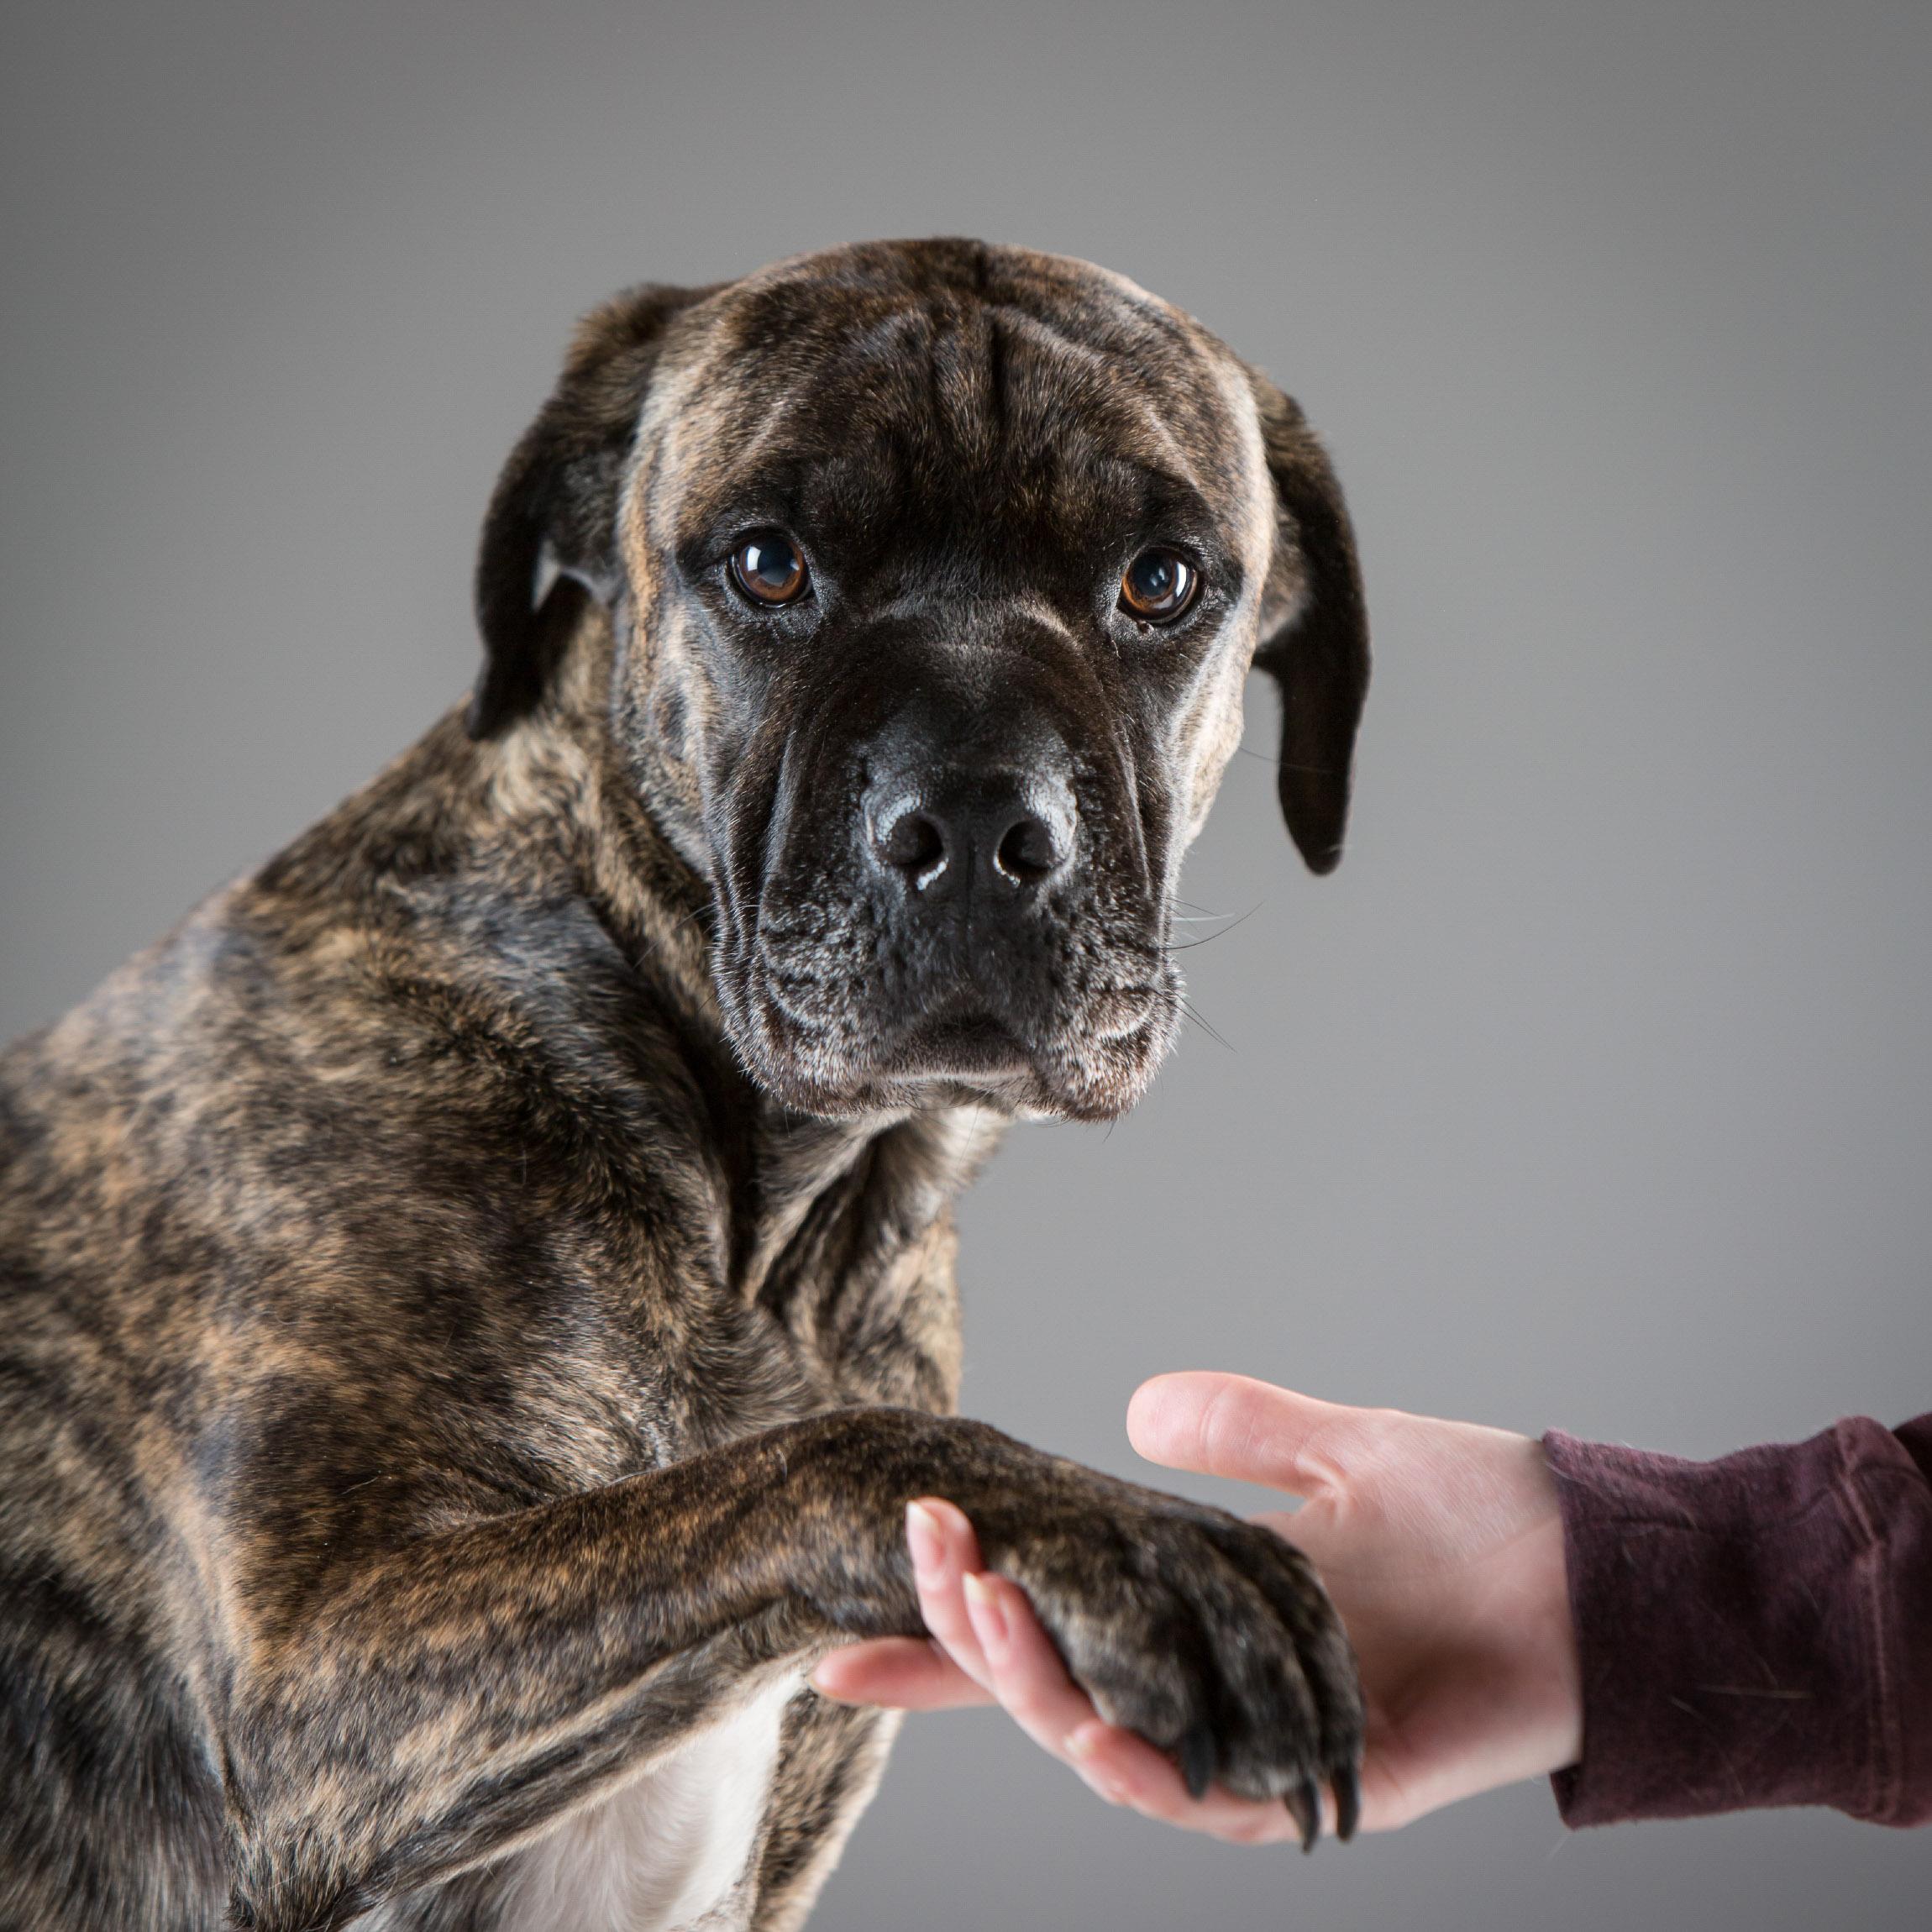 06 foto-gossos-celine-pech-andorra-0151